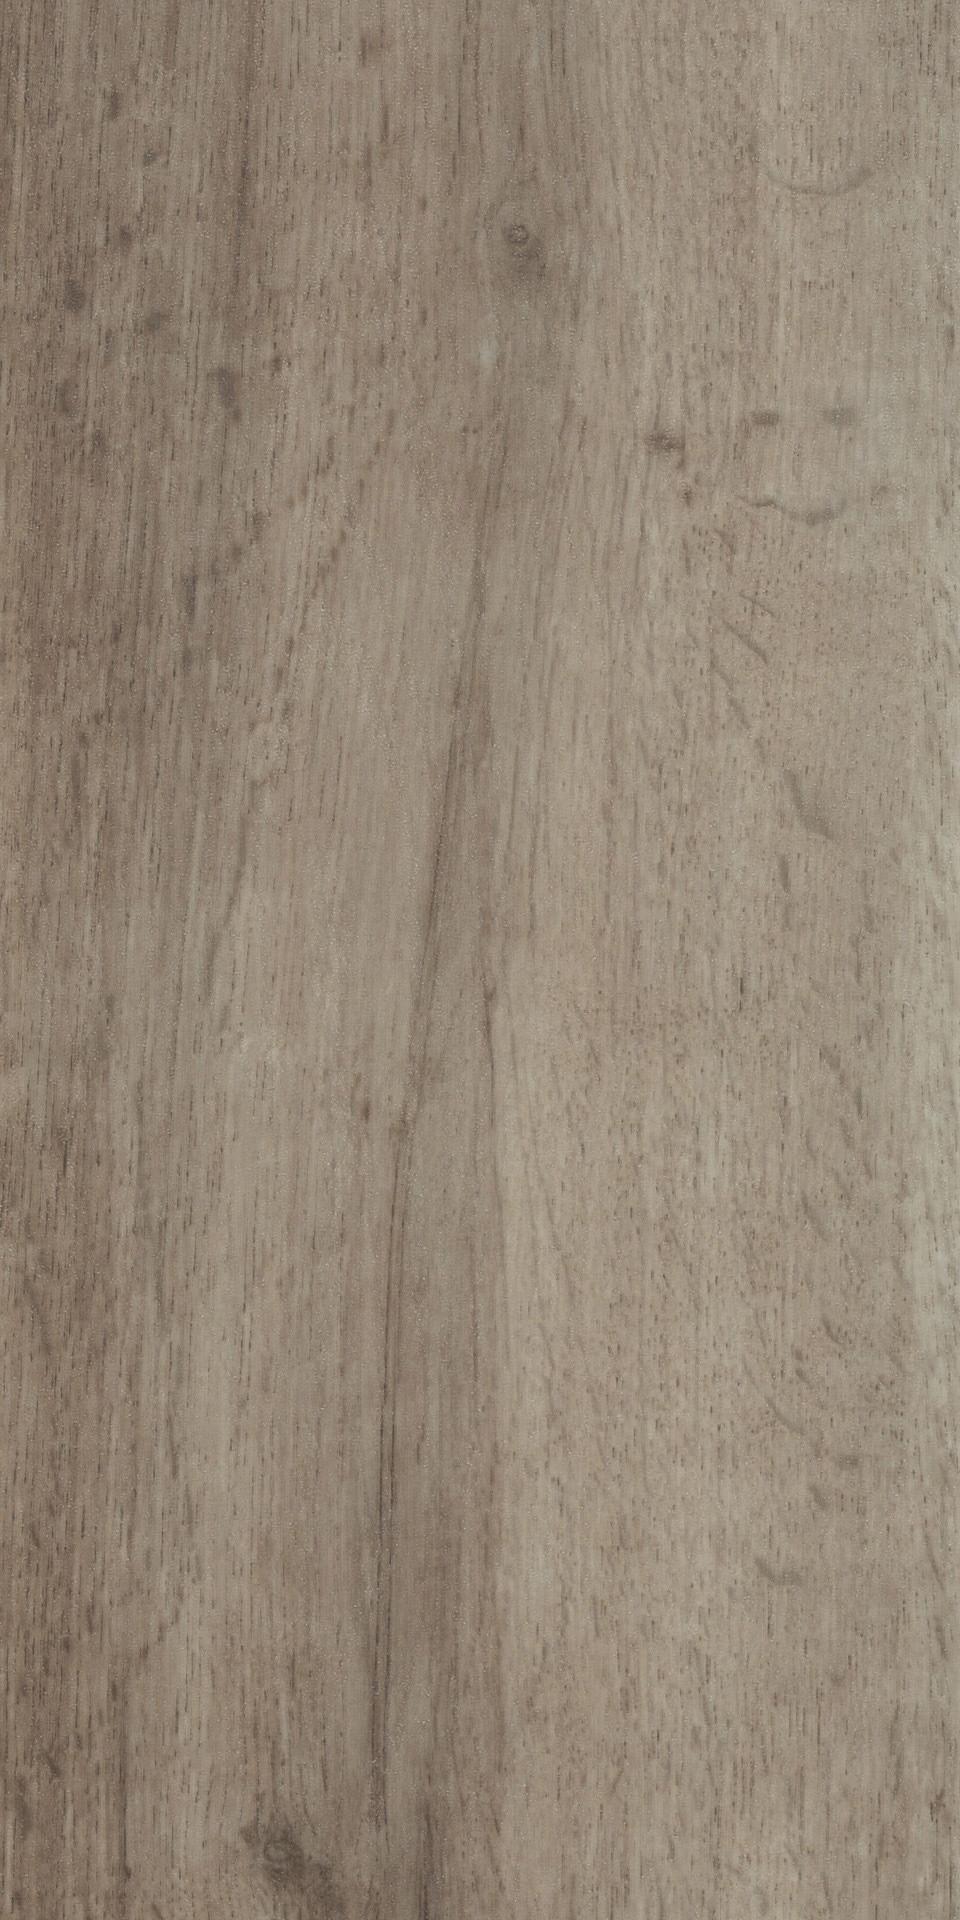 types of hardwood floors species of 26 unique grey hardwood floors photos flooring design ideas inside grey hardwood floors best of forbo allura flex 0 55 grey autumn oak selbstliegender vinylboden images